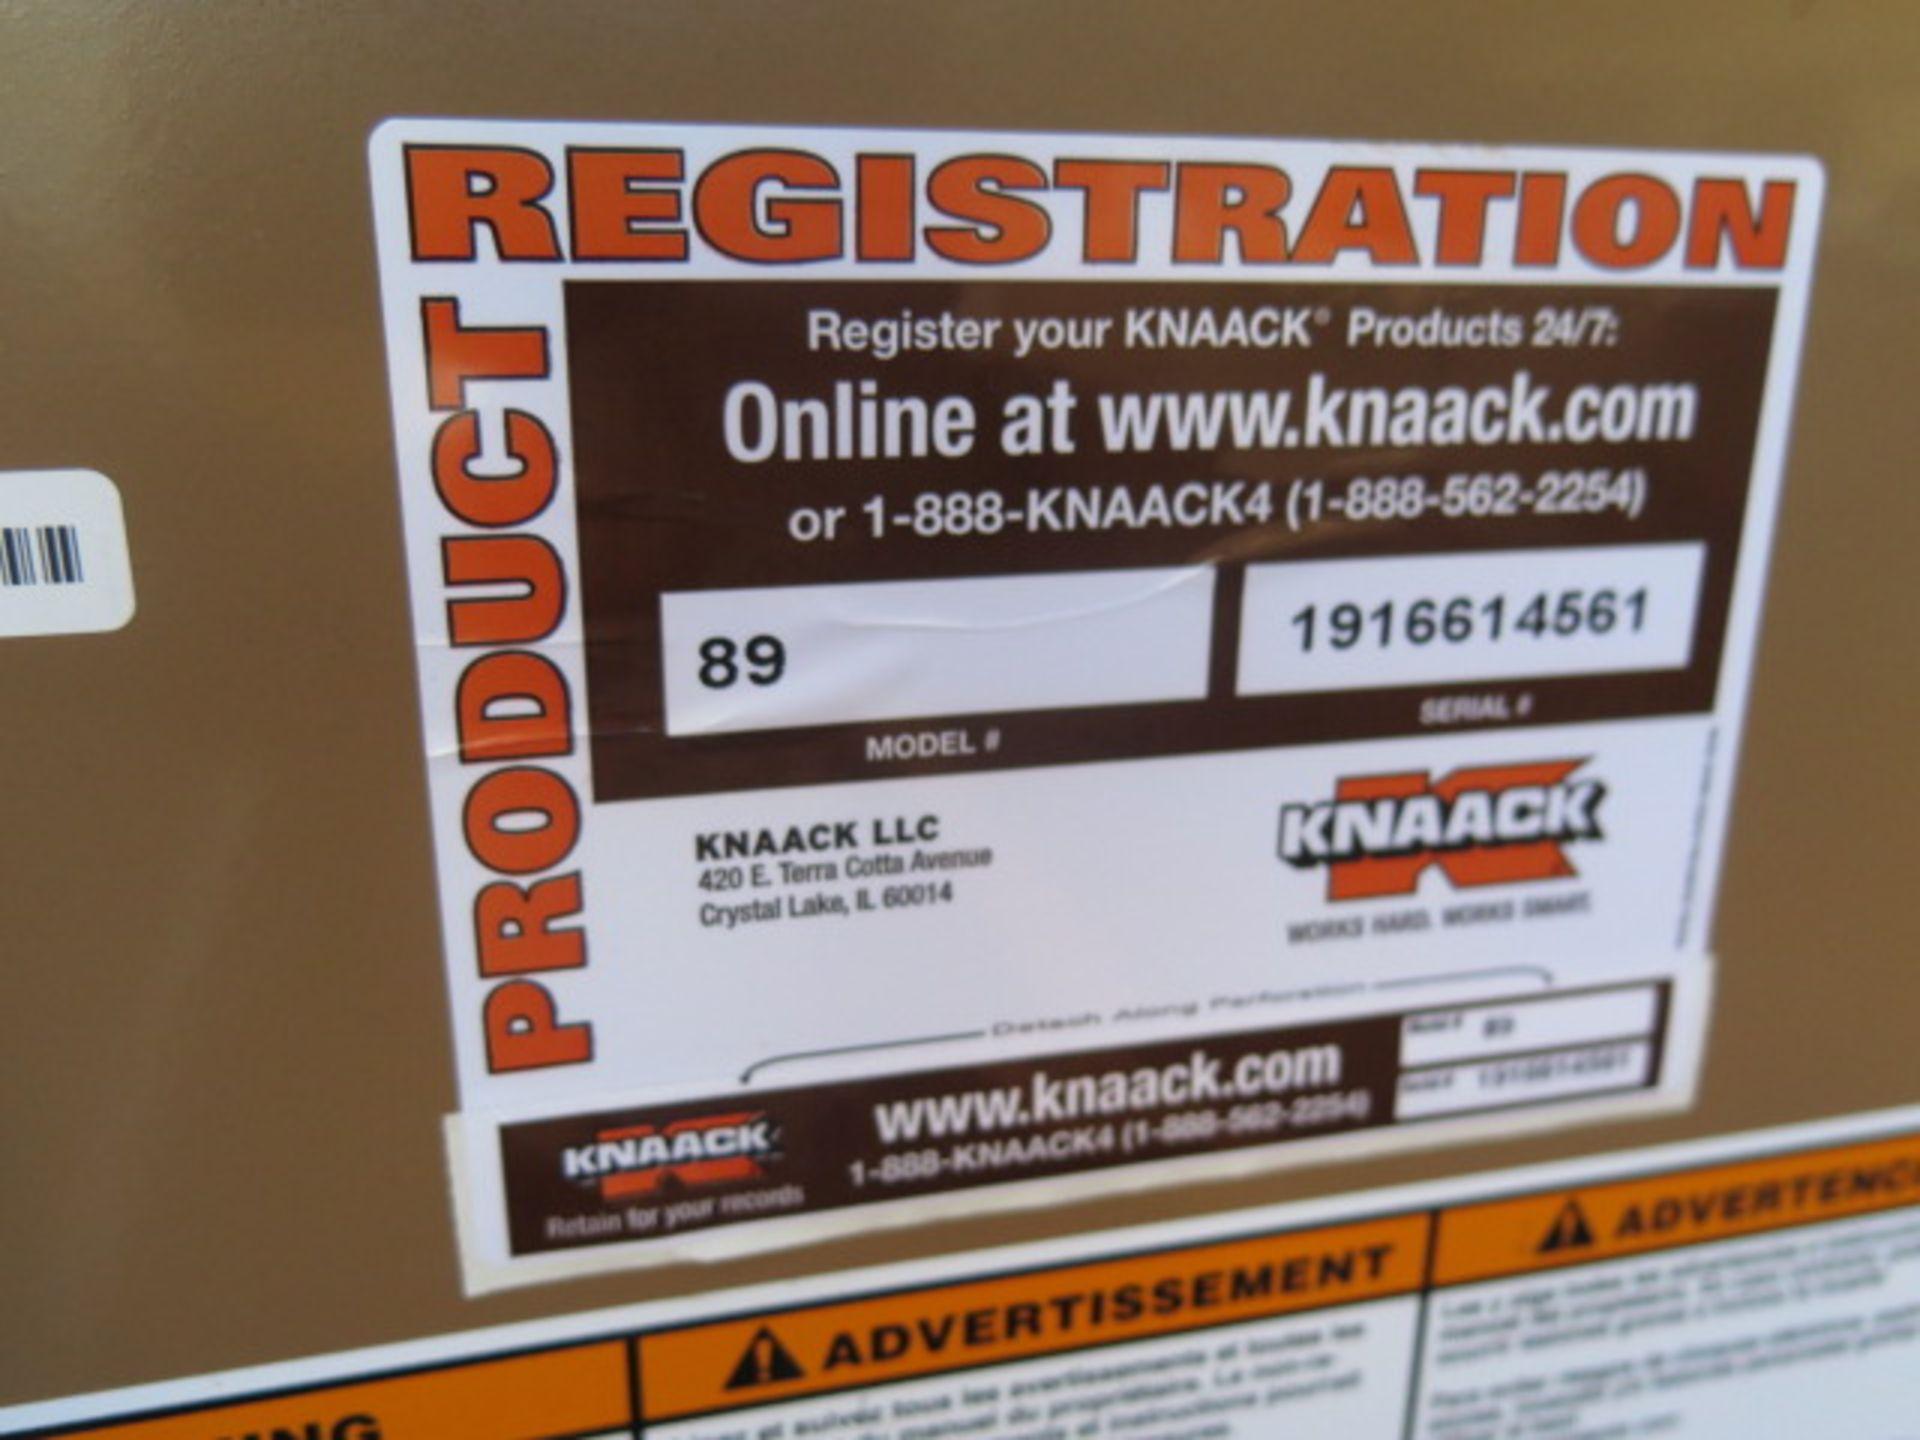 Knaack mdl. 89 Storagemaster Rolling Job Box w/ Come-Alongs (SOLD AS-IS - NO WARRANTY) - Image 12 of 12